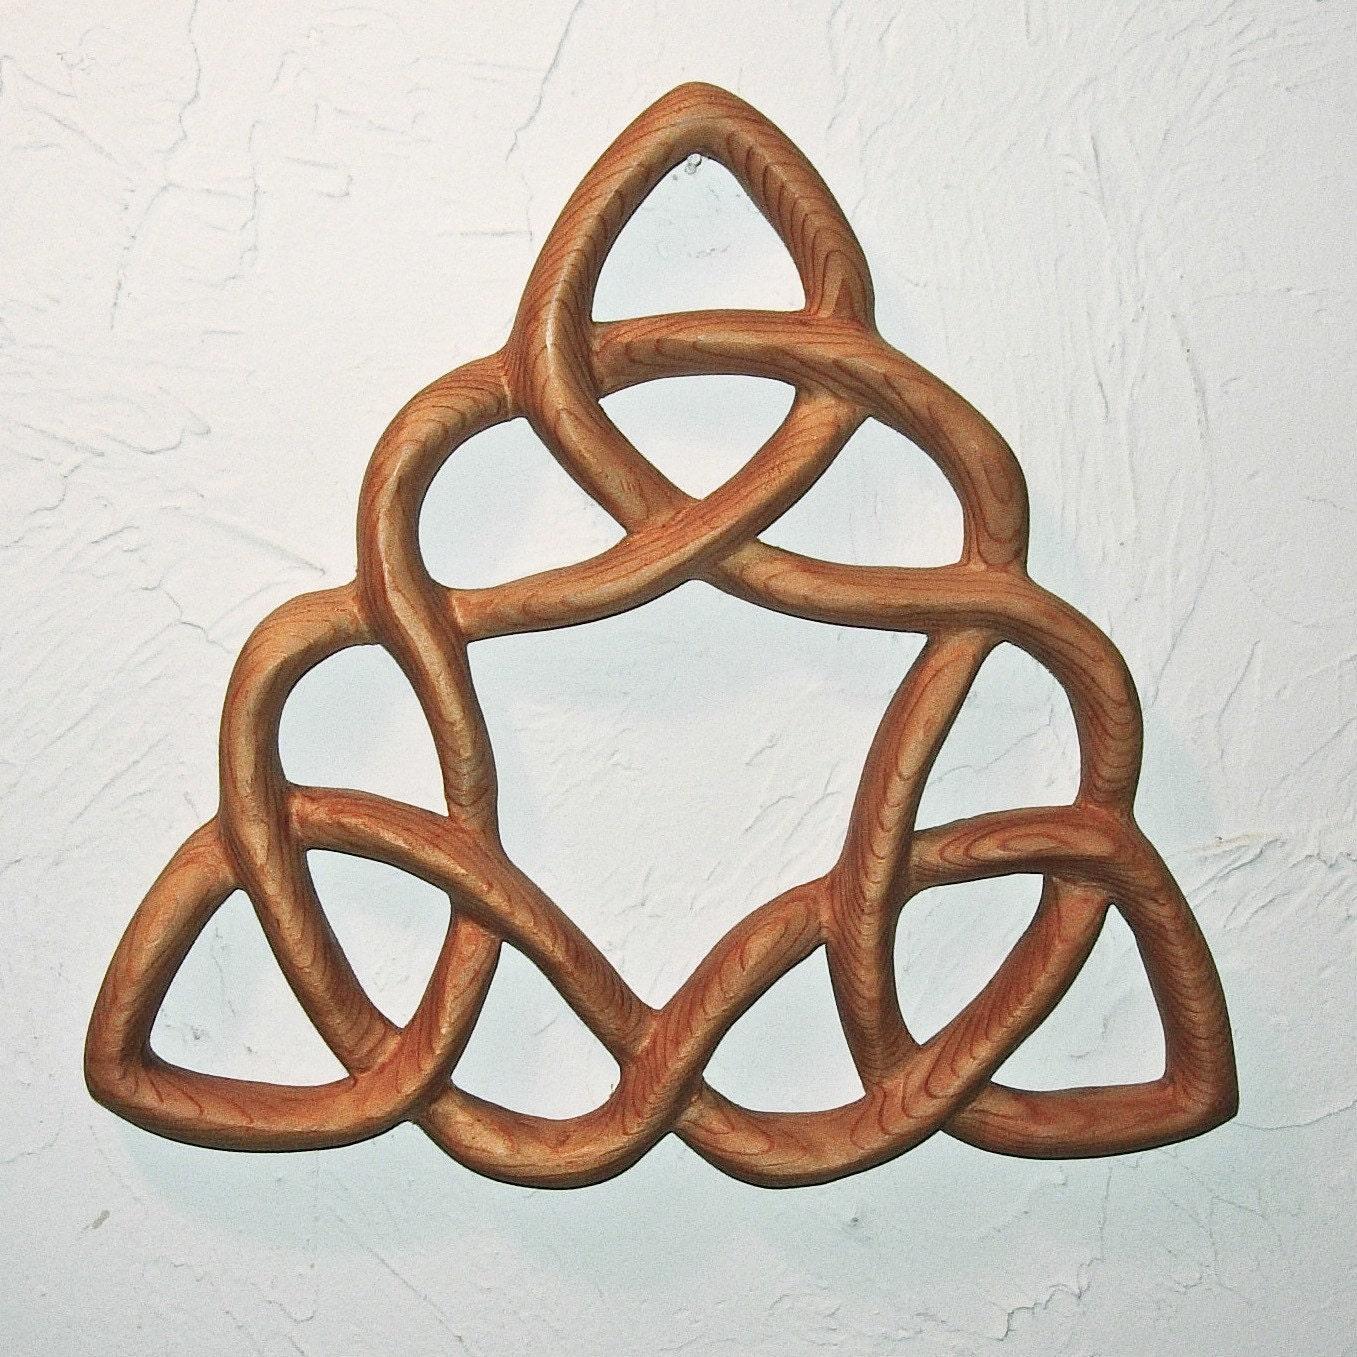 Cloverleaf Triquetra Wood Carved Celtic Knot by signsofspirit